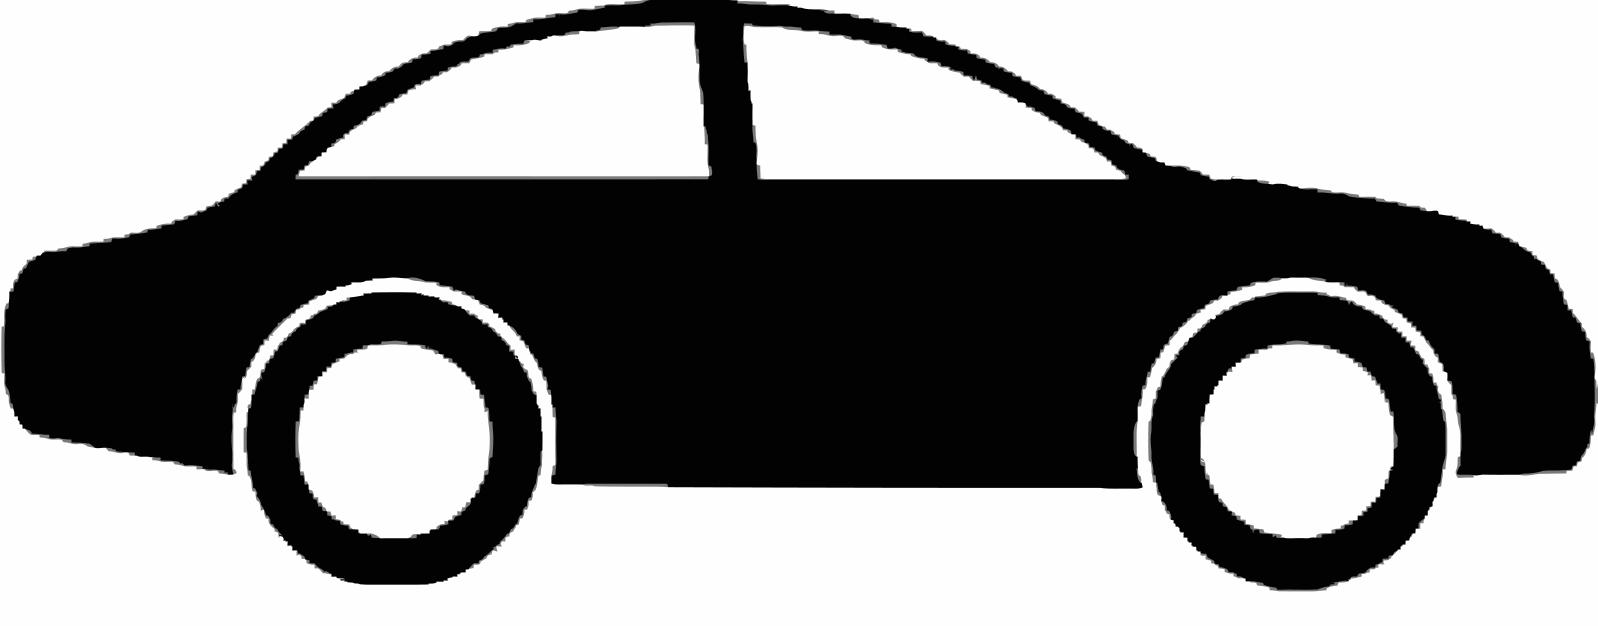 Car V Vectorized Image